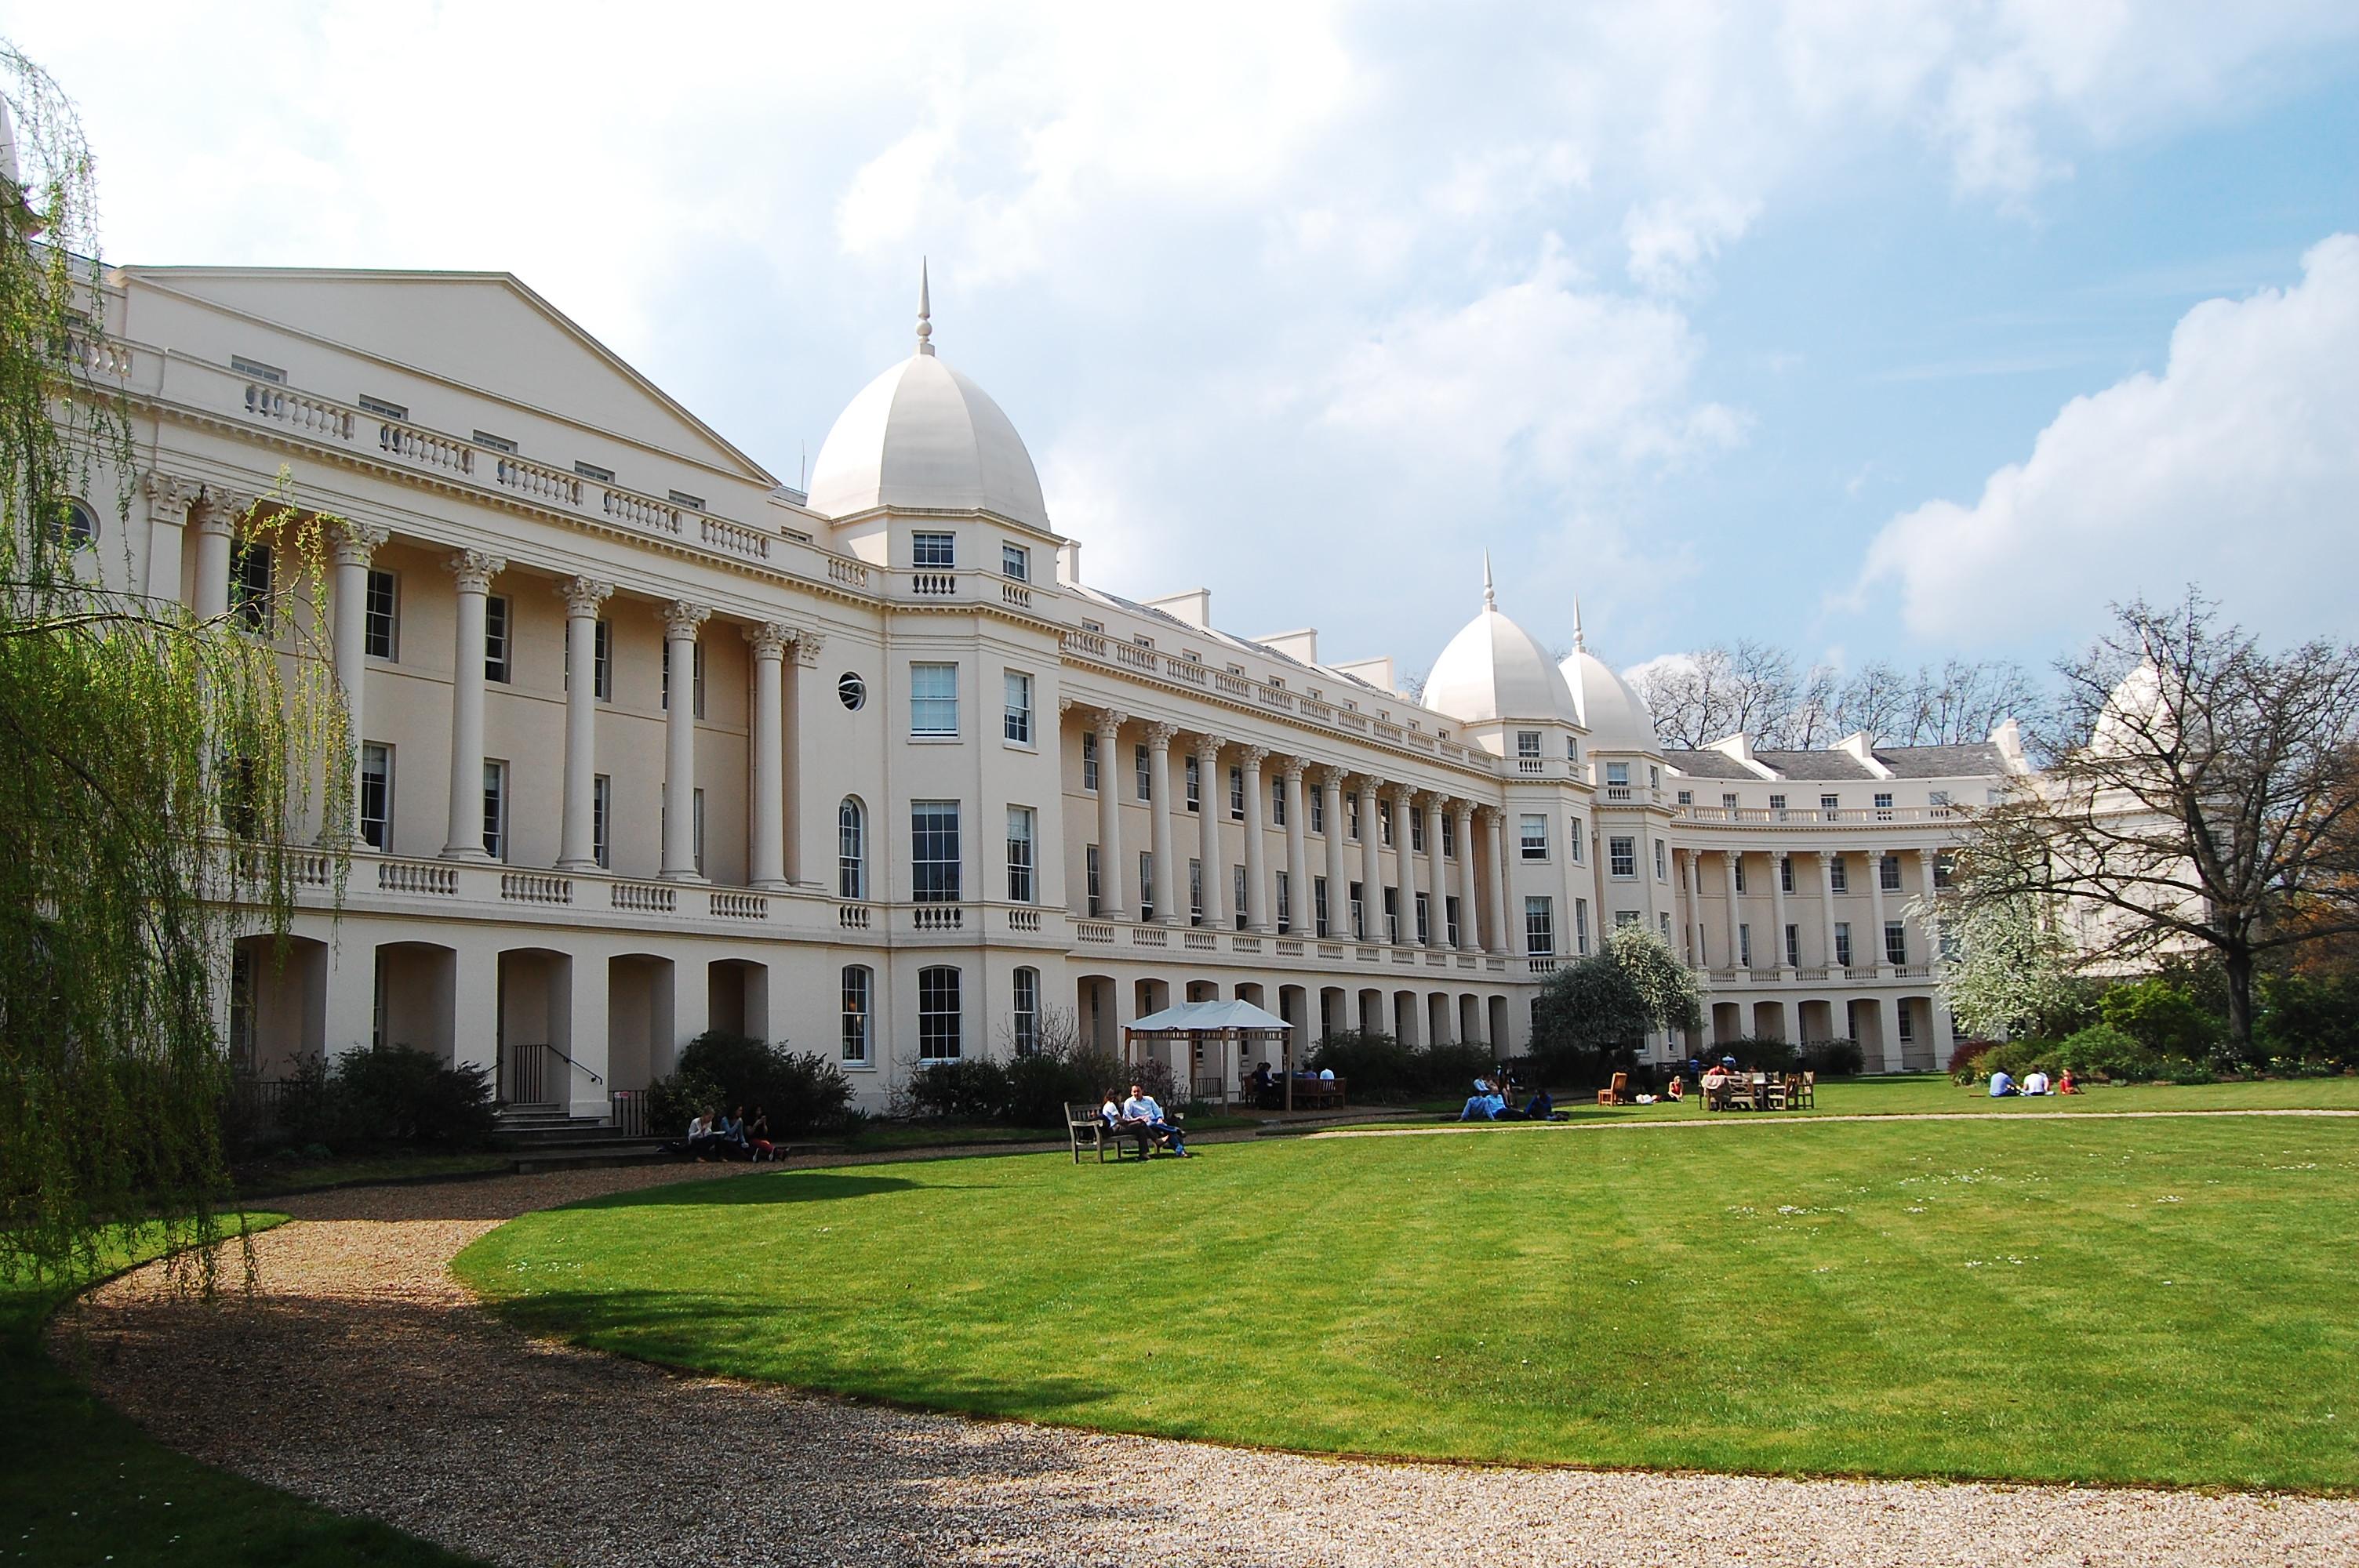 Financing binary options courses london shoool